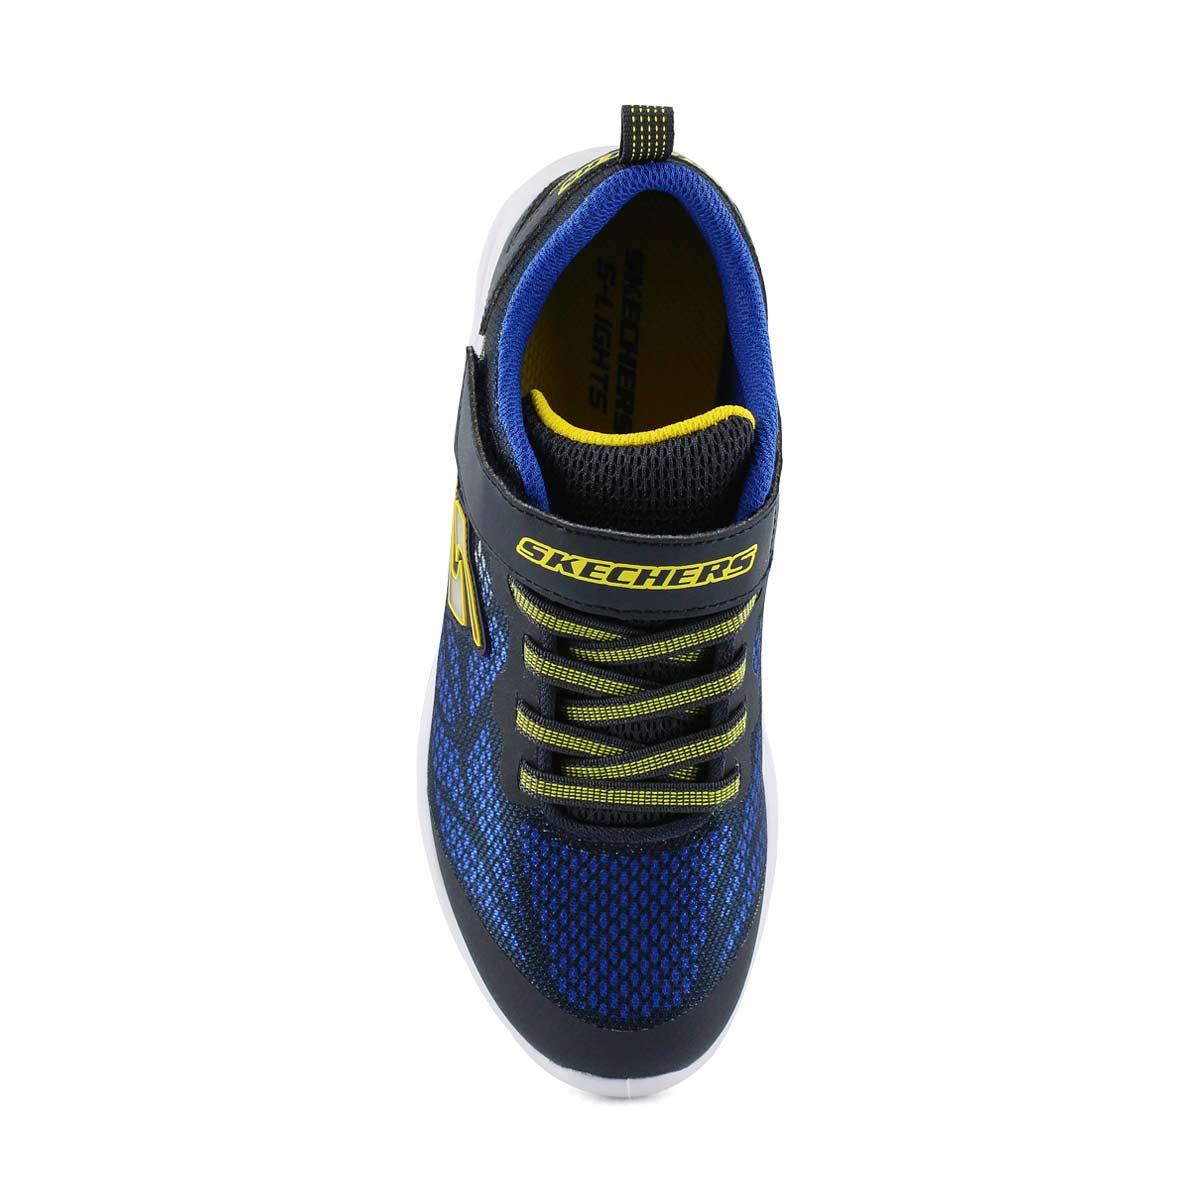 Boys' Vortex-Flash Sneakers - Navy/Yellow